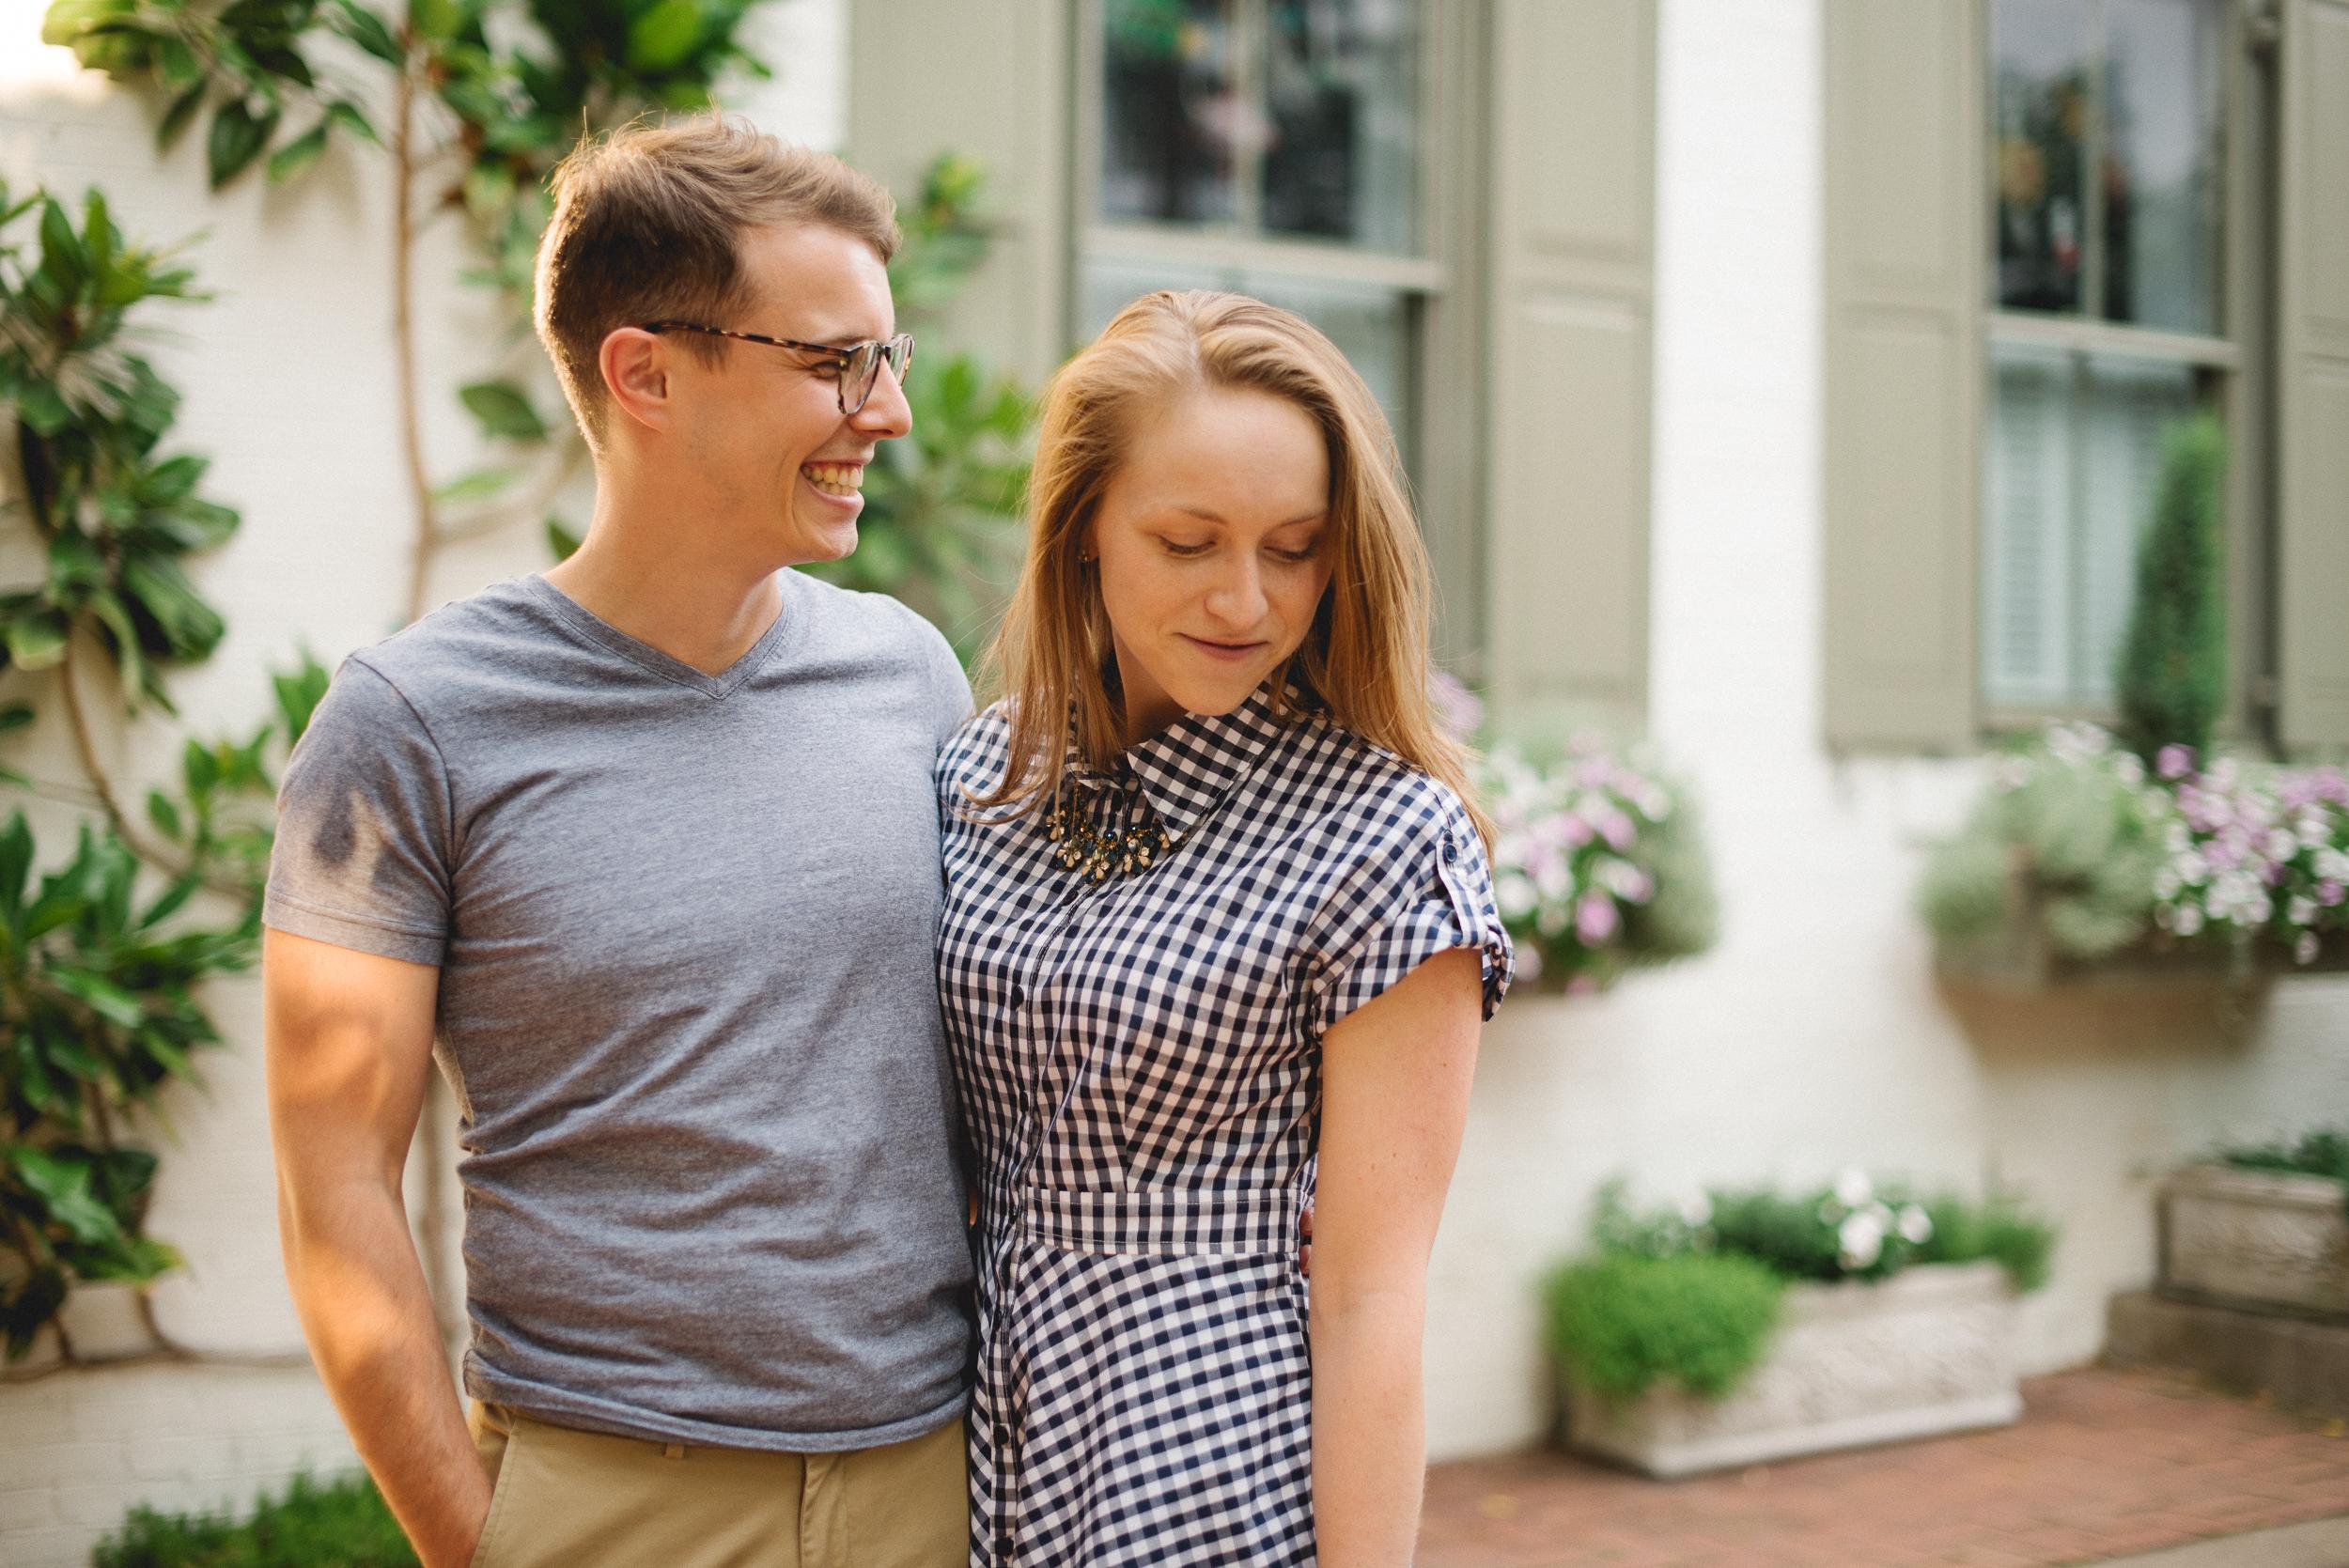 Peaberry-Photography-Society-Hill-Philadelphia-Pennsylvania-Newlyweds-Just-Married-022.jpg